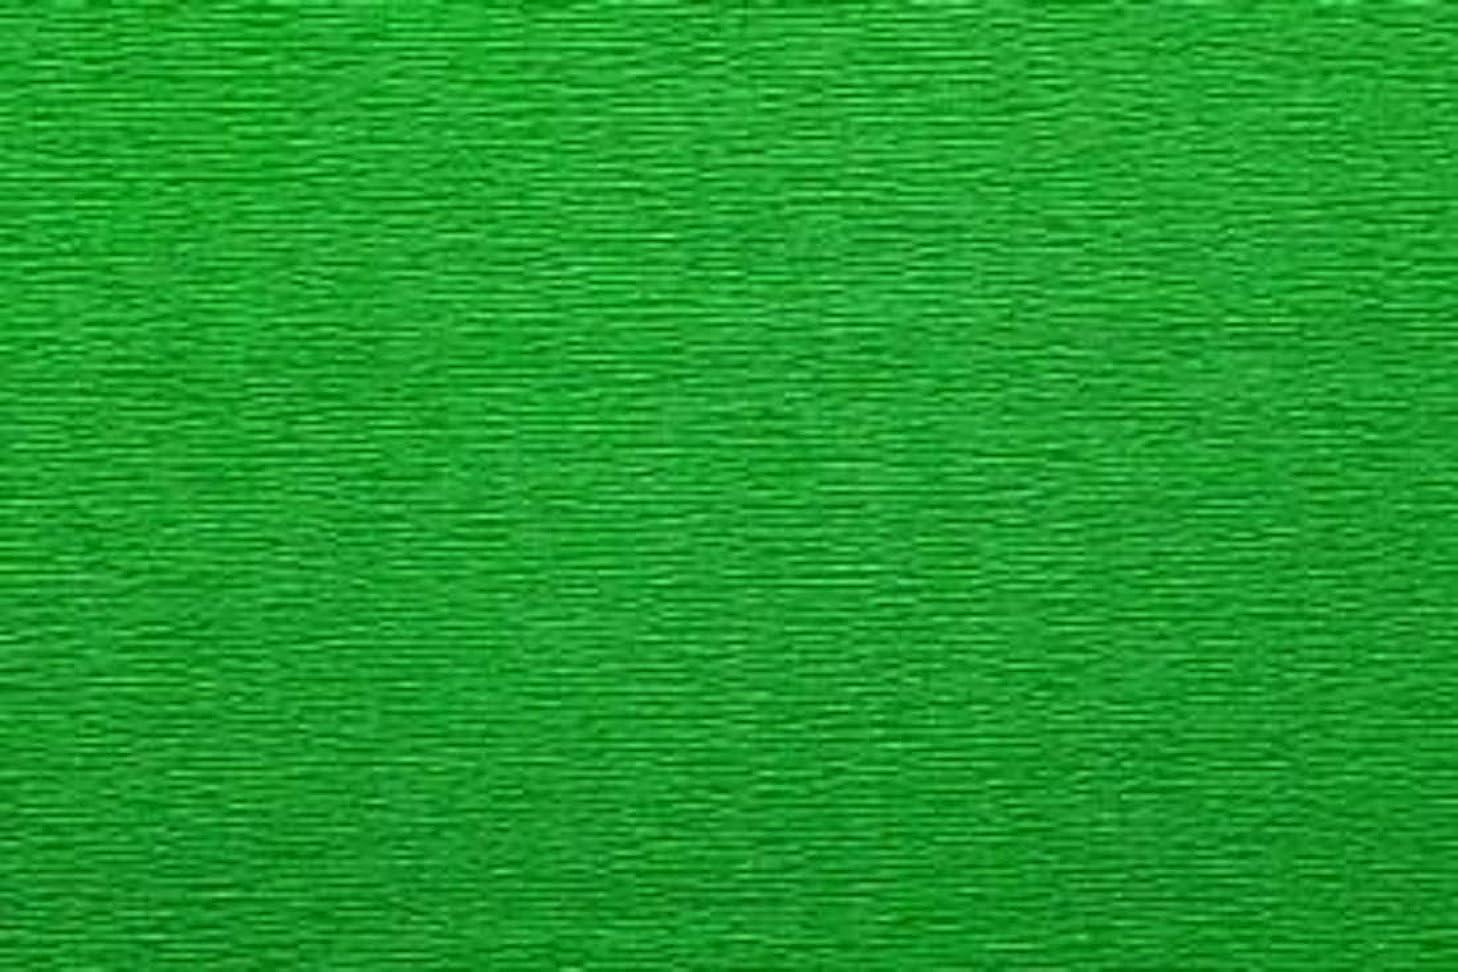 Crepe Paper Roll, Premium Italian Extra Fine 60 g, 13.3 sqft, Field Green